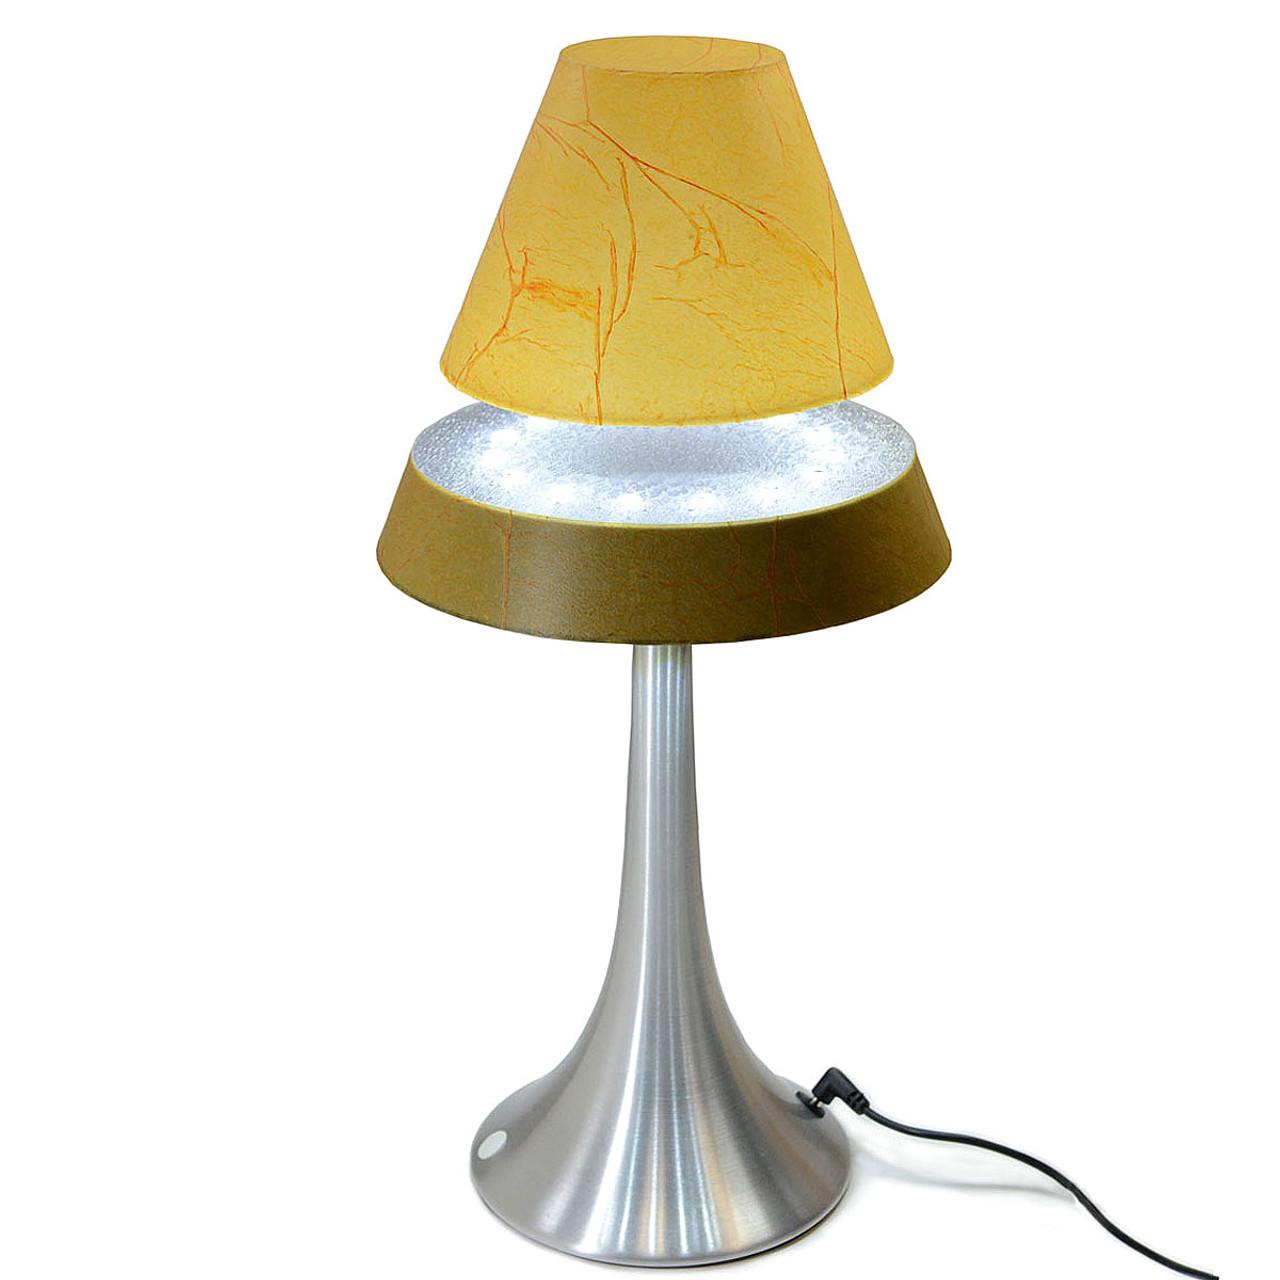 Levitating table lamp emilyevanseerdmans magic levitating table lamp cms magnetics geotapseo Image collections